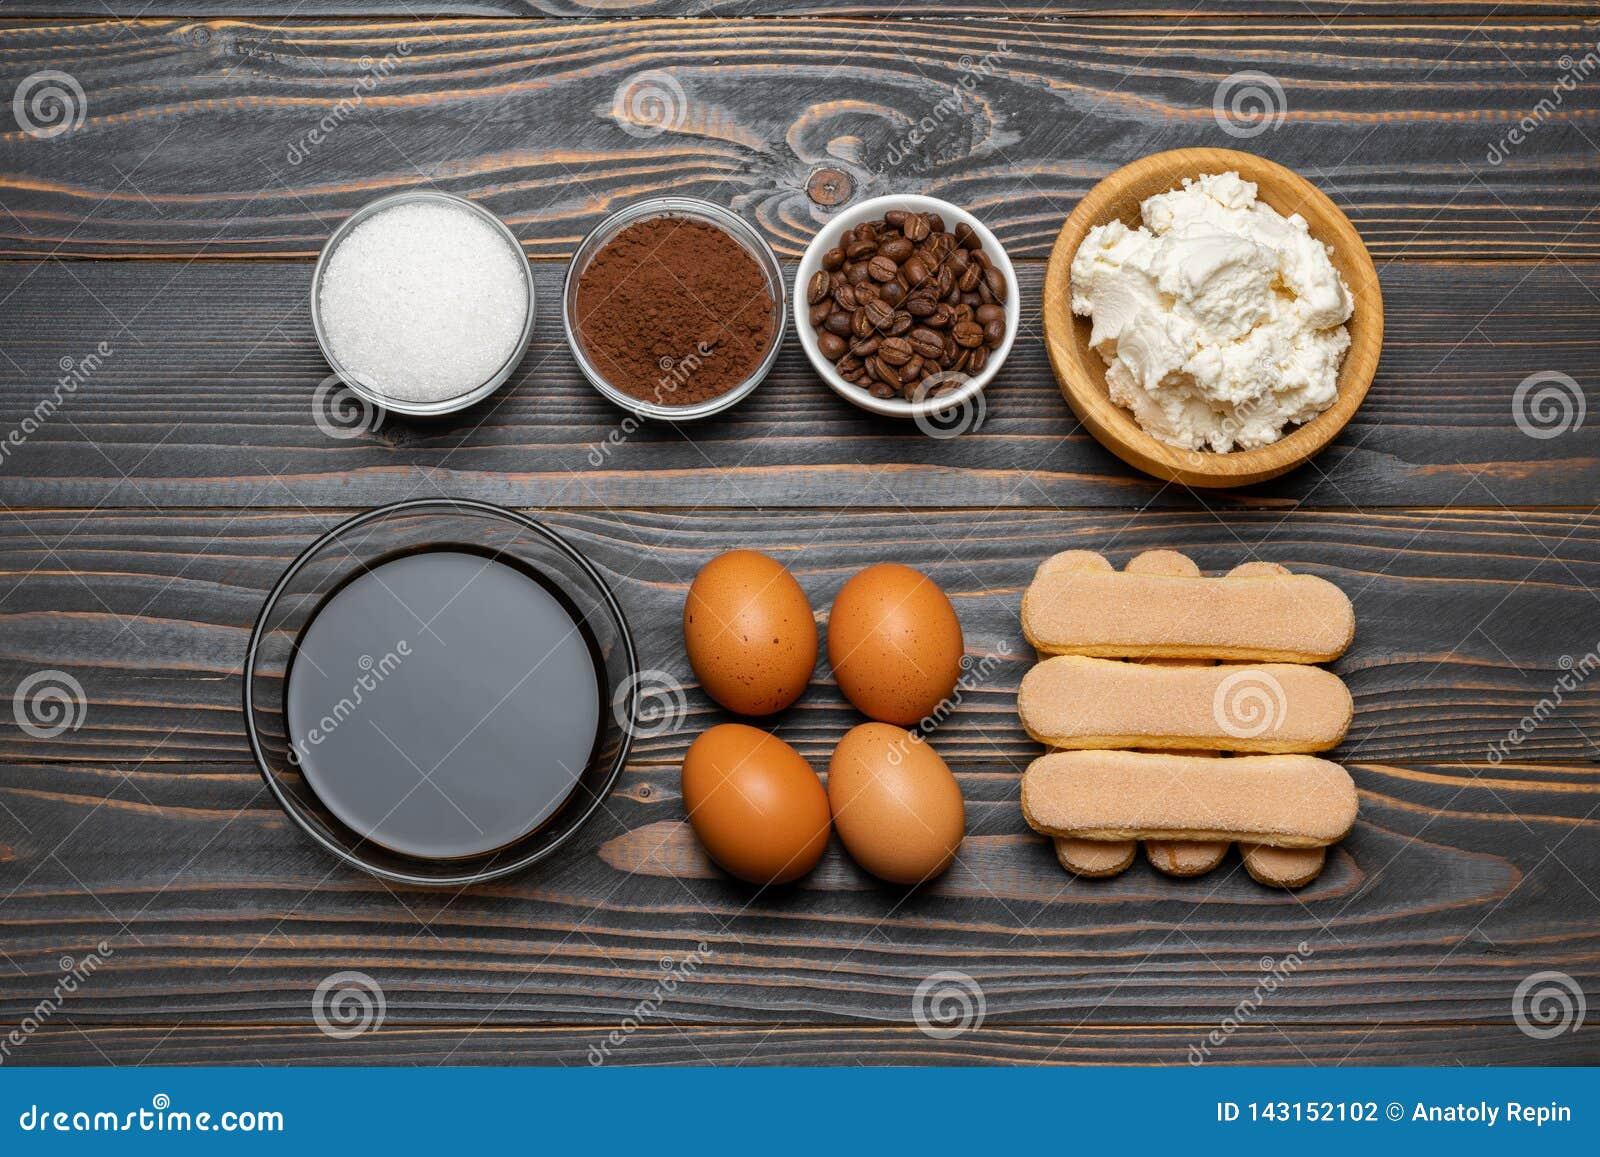 Sk?adniki dla kulinarnego tiramisu Savoiardi biskwitowi ciastka, mascarpone, ser, cukier, kakao, kawa i jajko -,